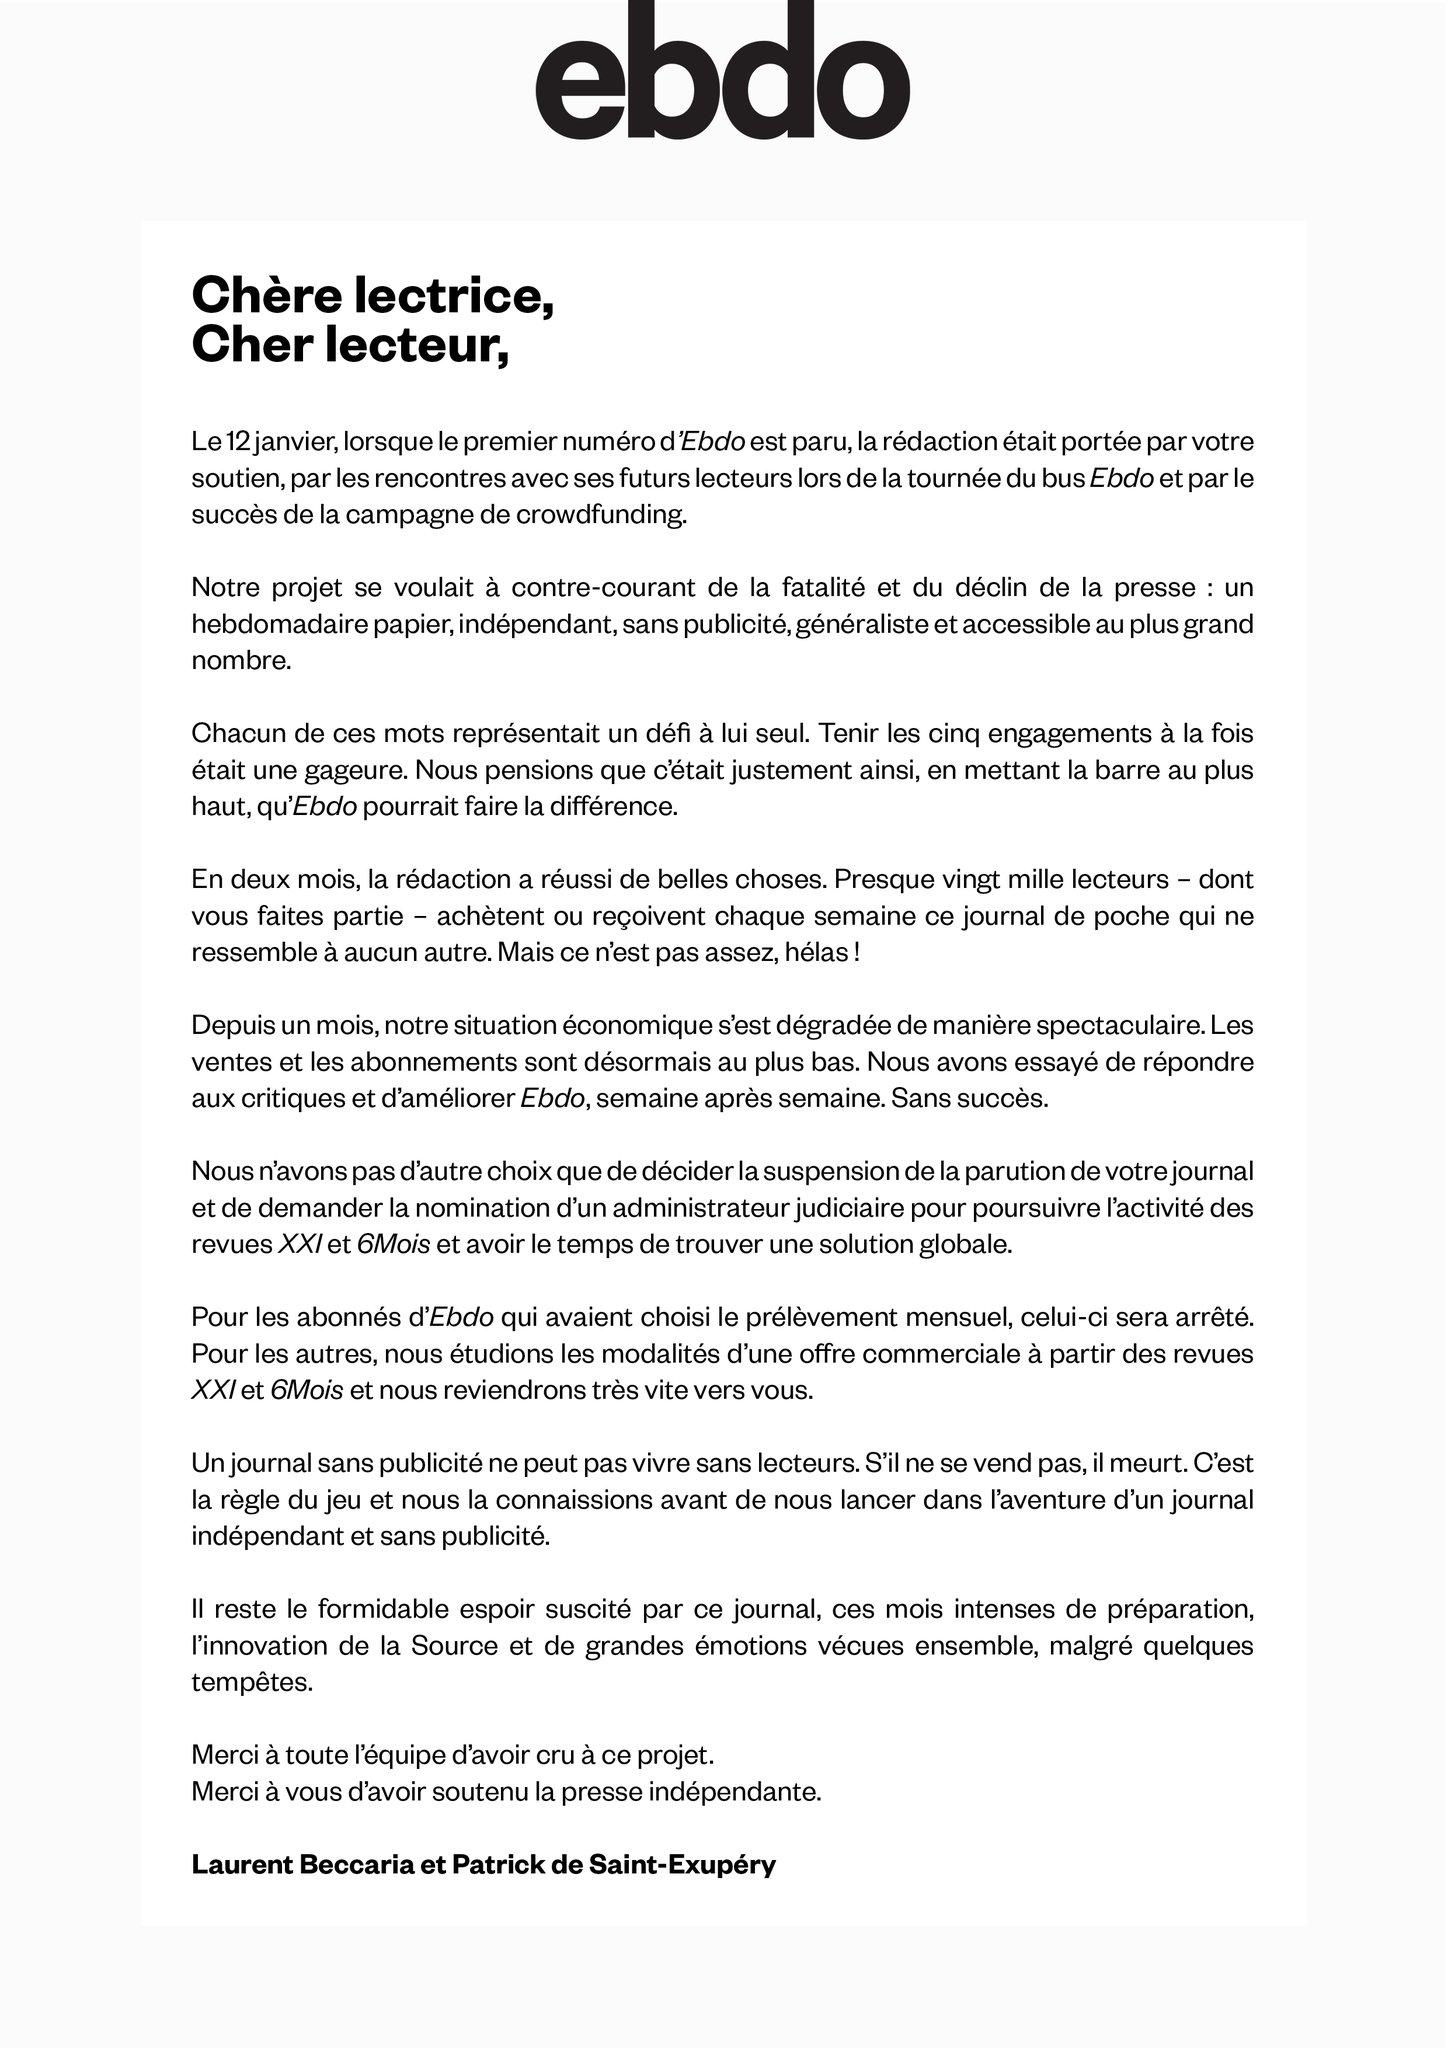 ebdo, 23 mars 2018, lettre annonçant la fin du titre